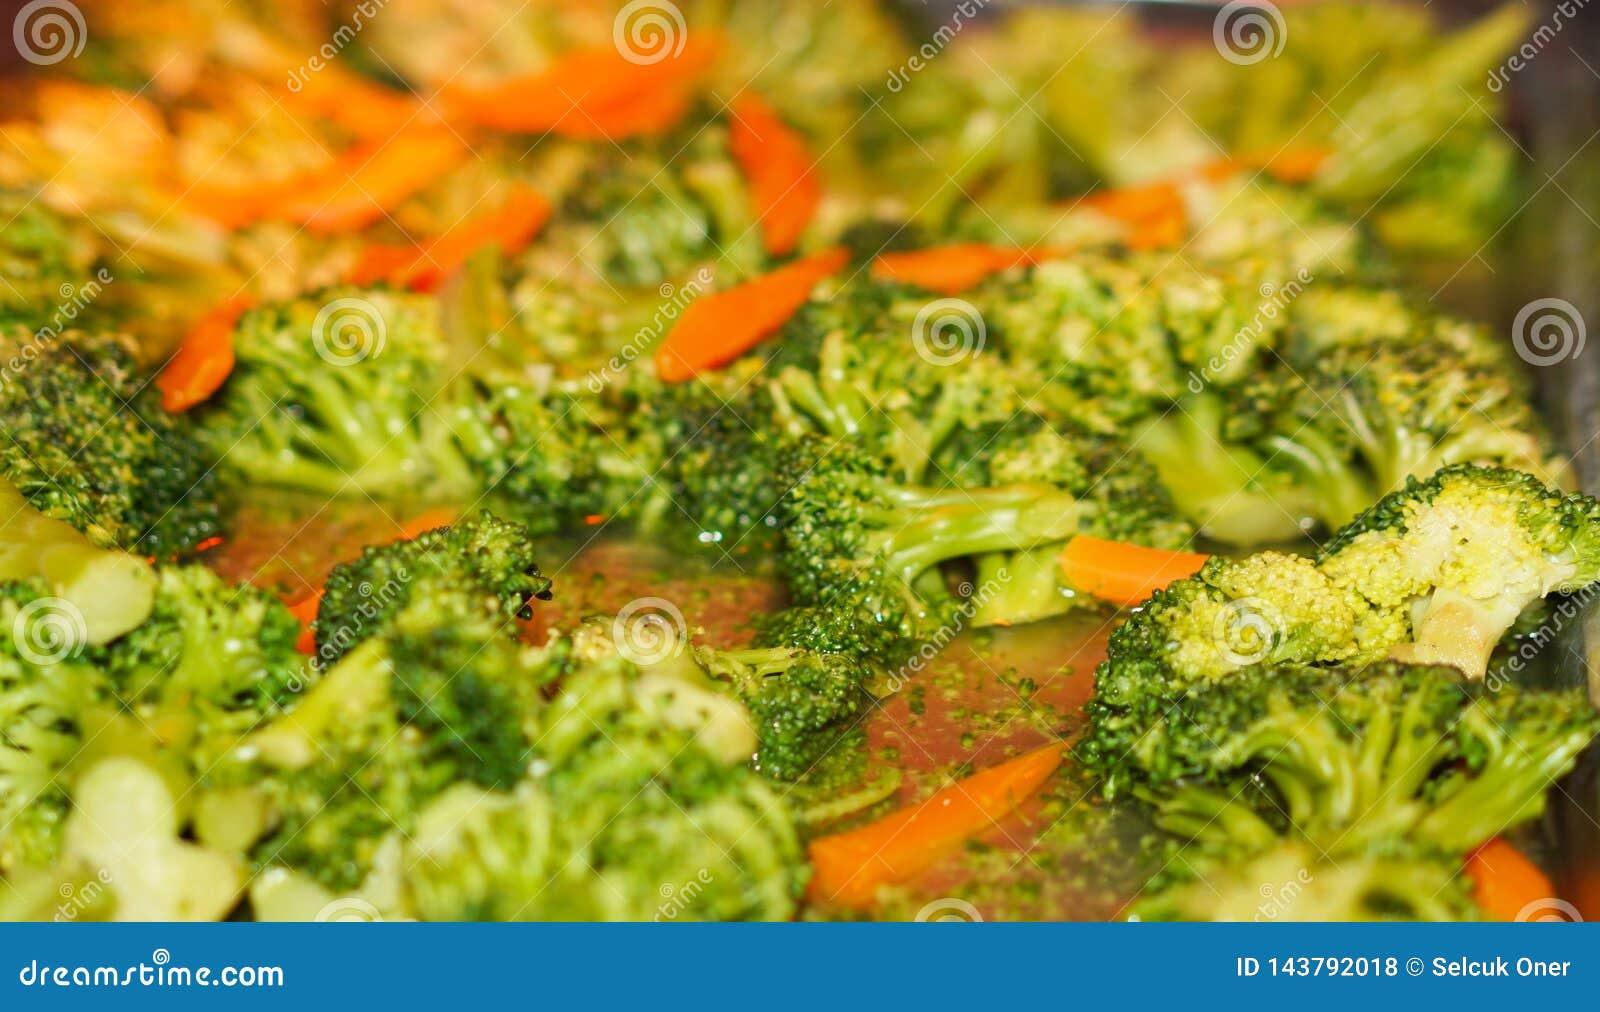 Broccoli salat with carrots